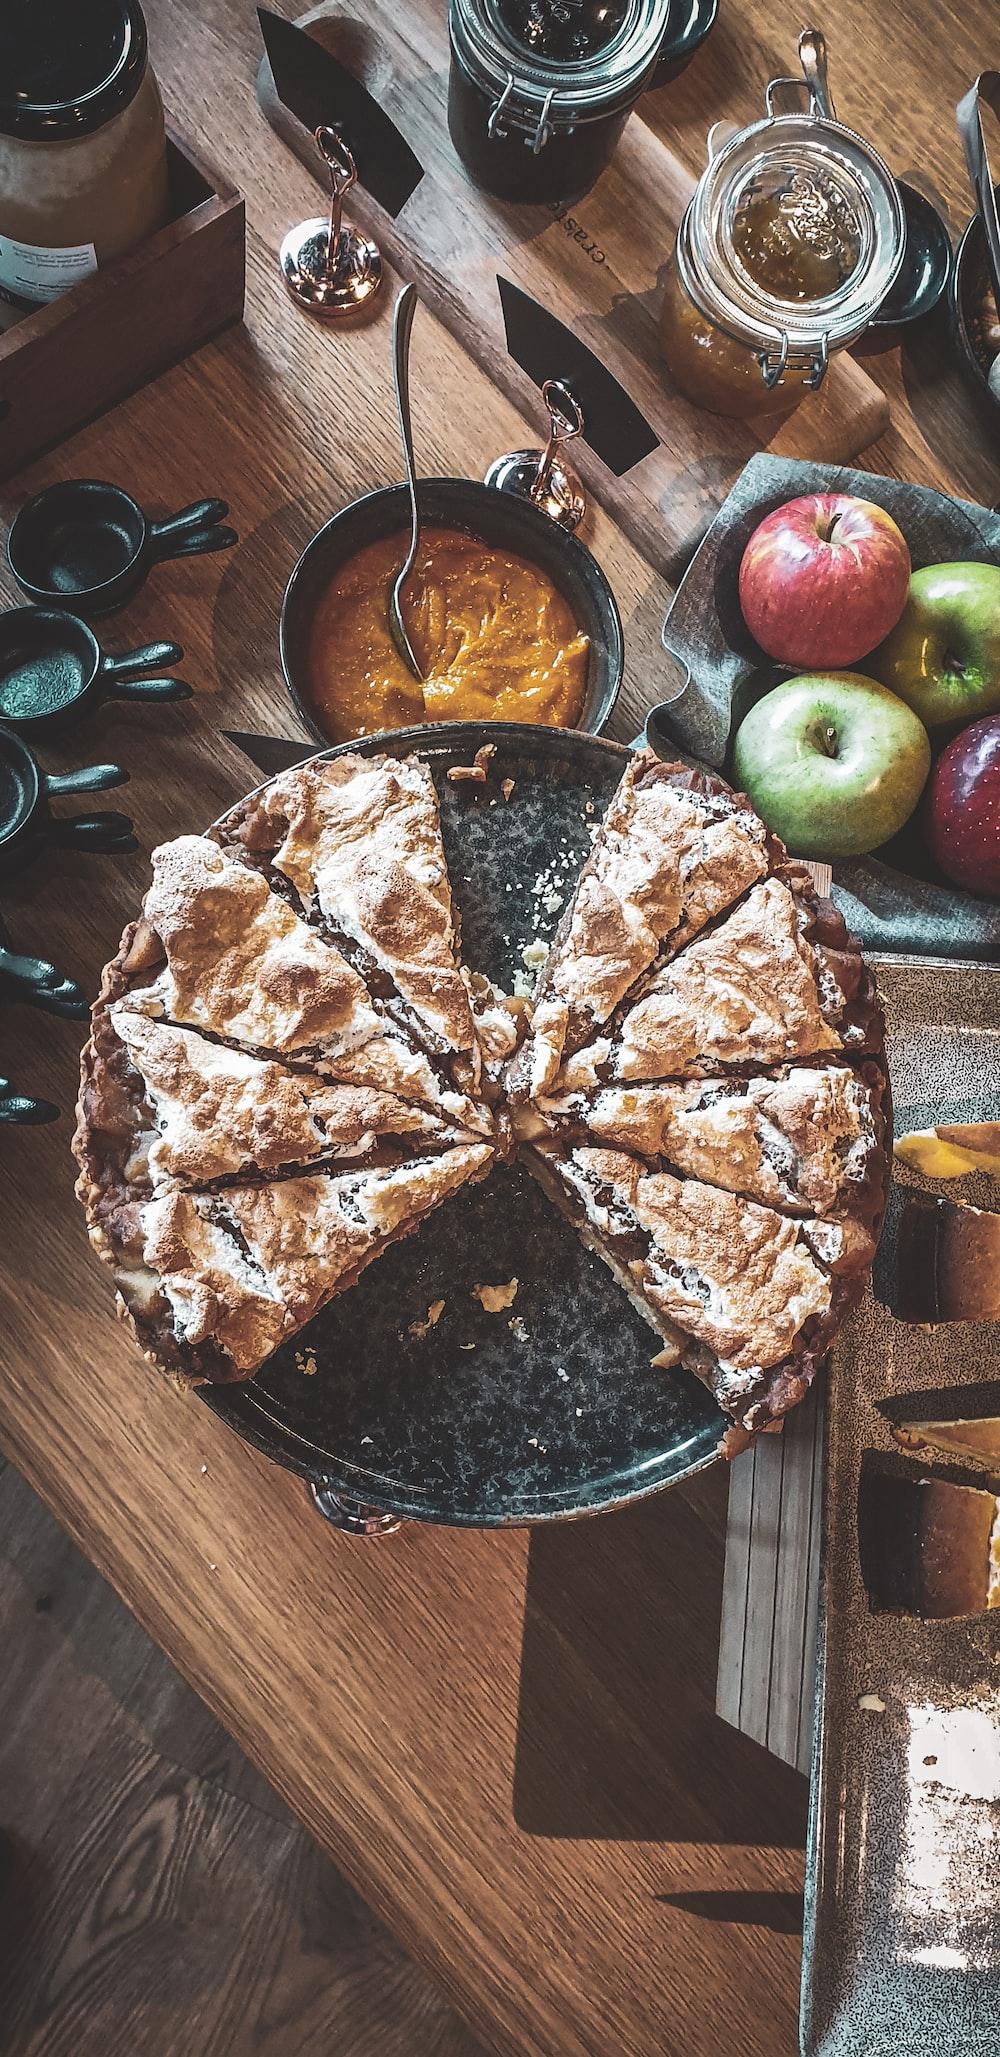 sliced pie on black round plate